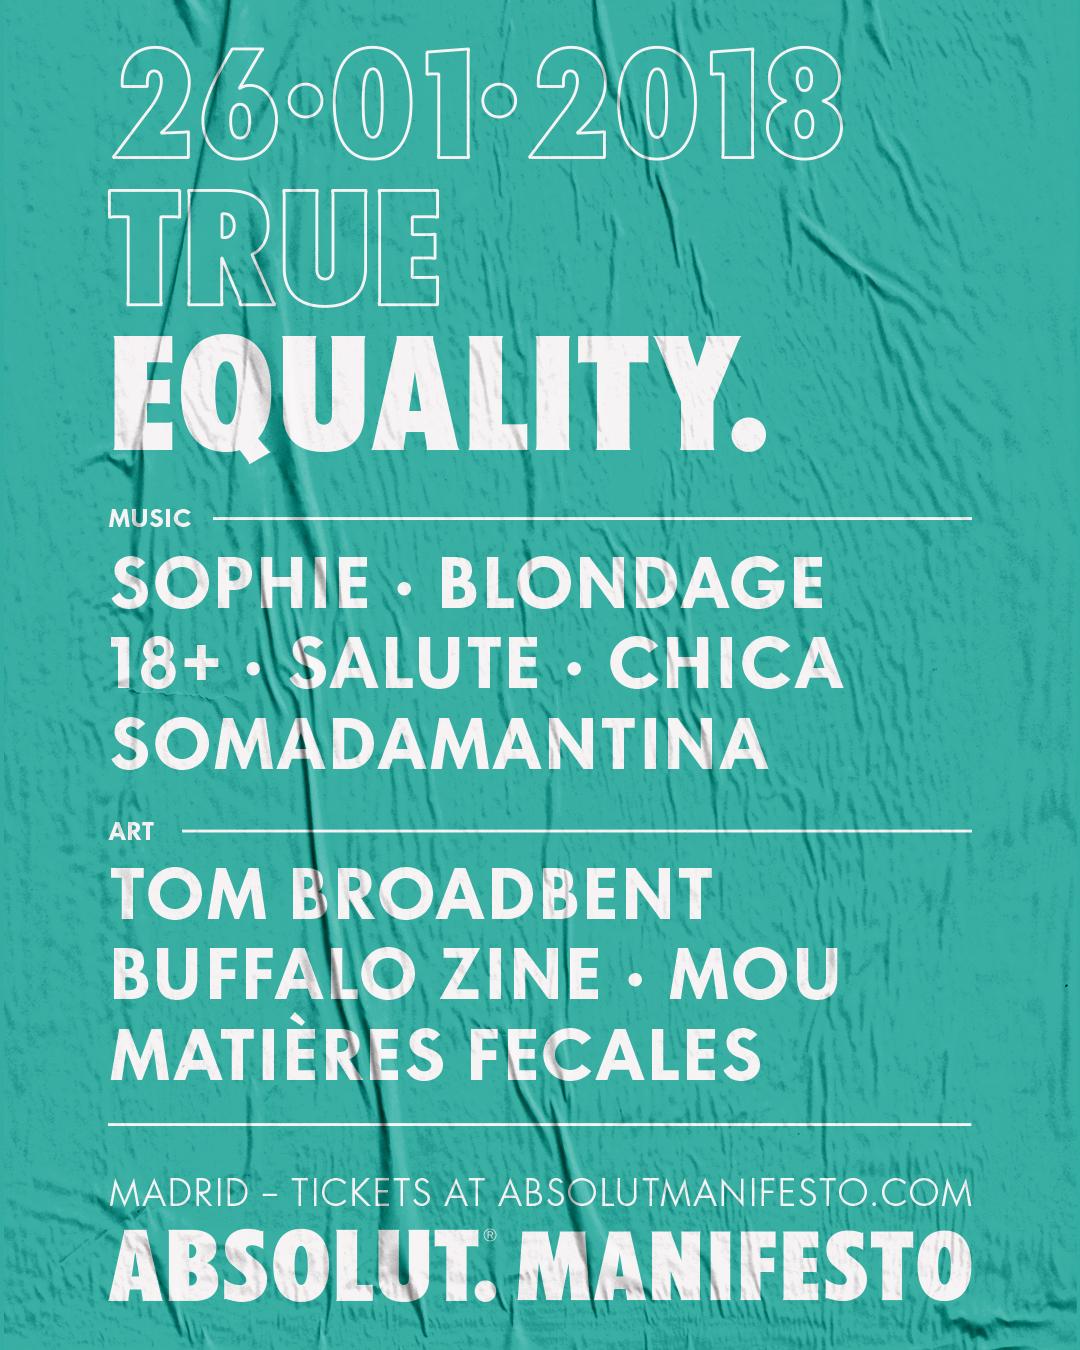 lineup-trueequality-ig